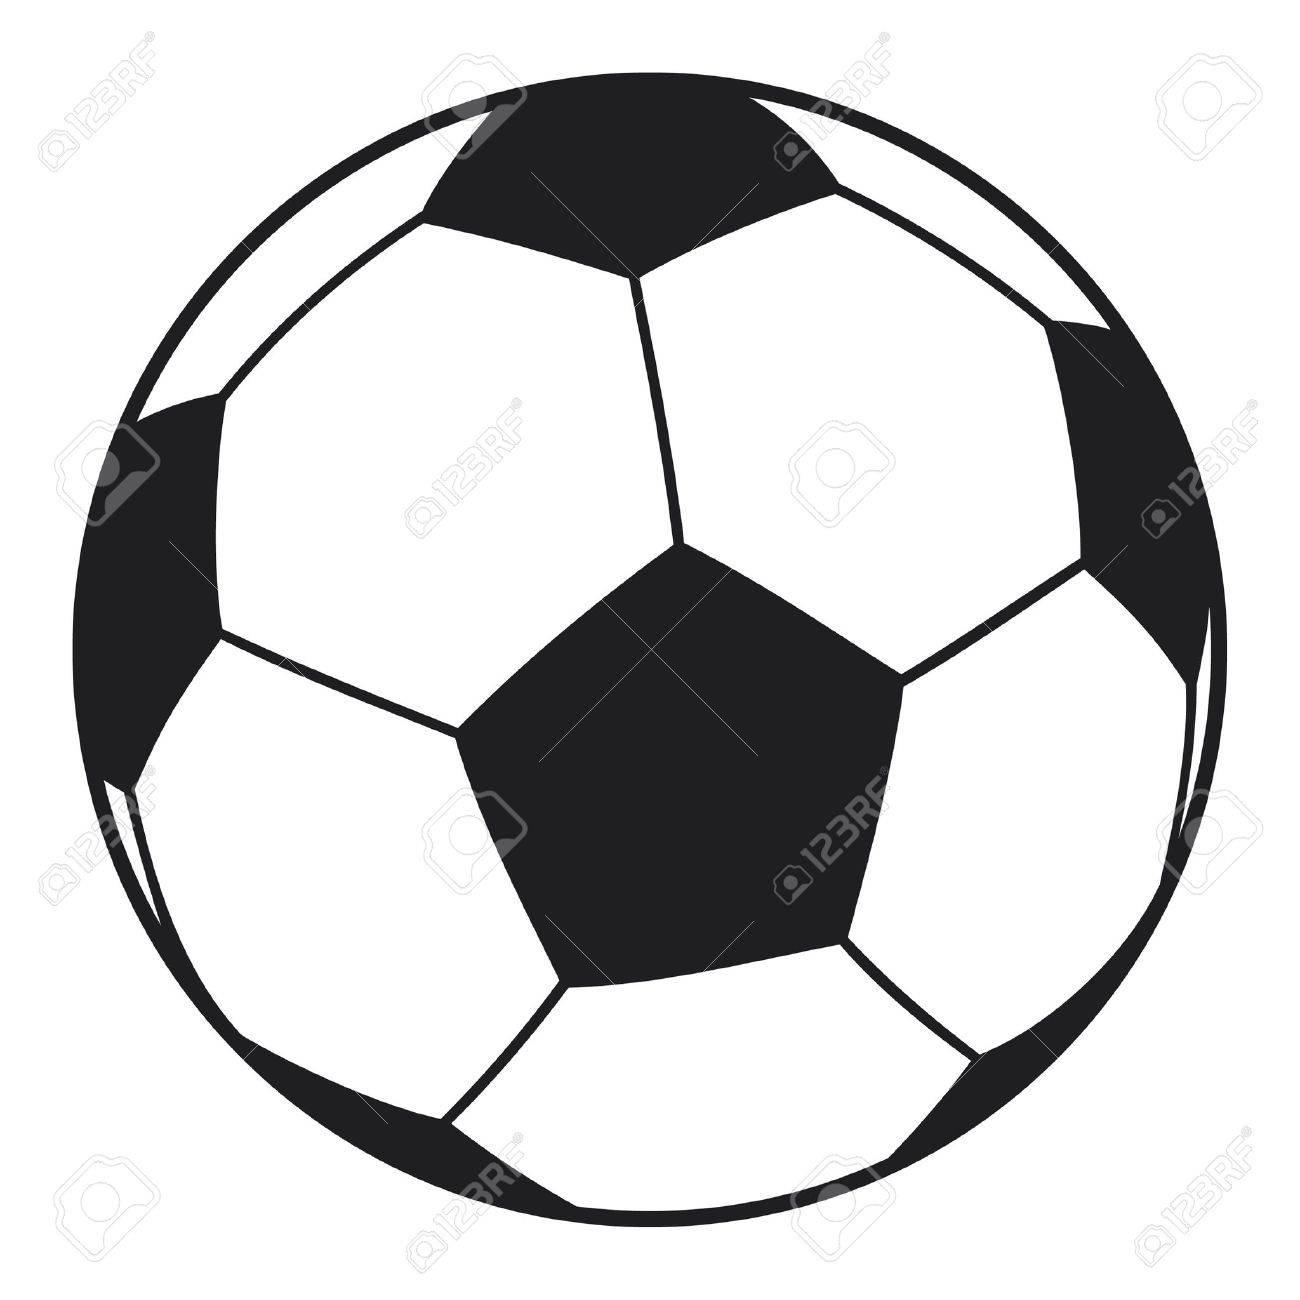 1300x1300 Vector Football Ball (Soccer Ball) Royalty Free Cliparts, Vectors